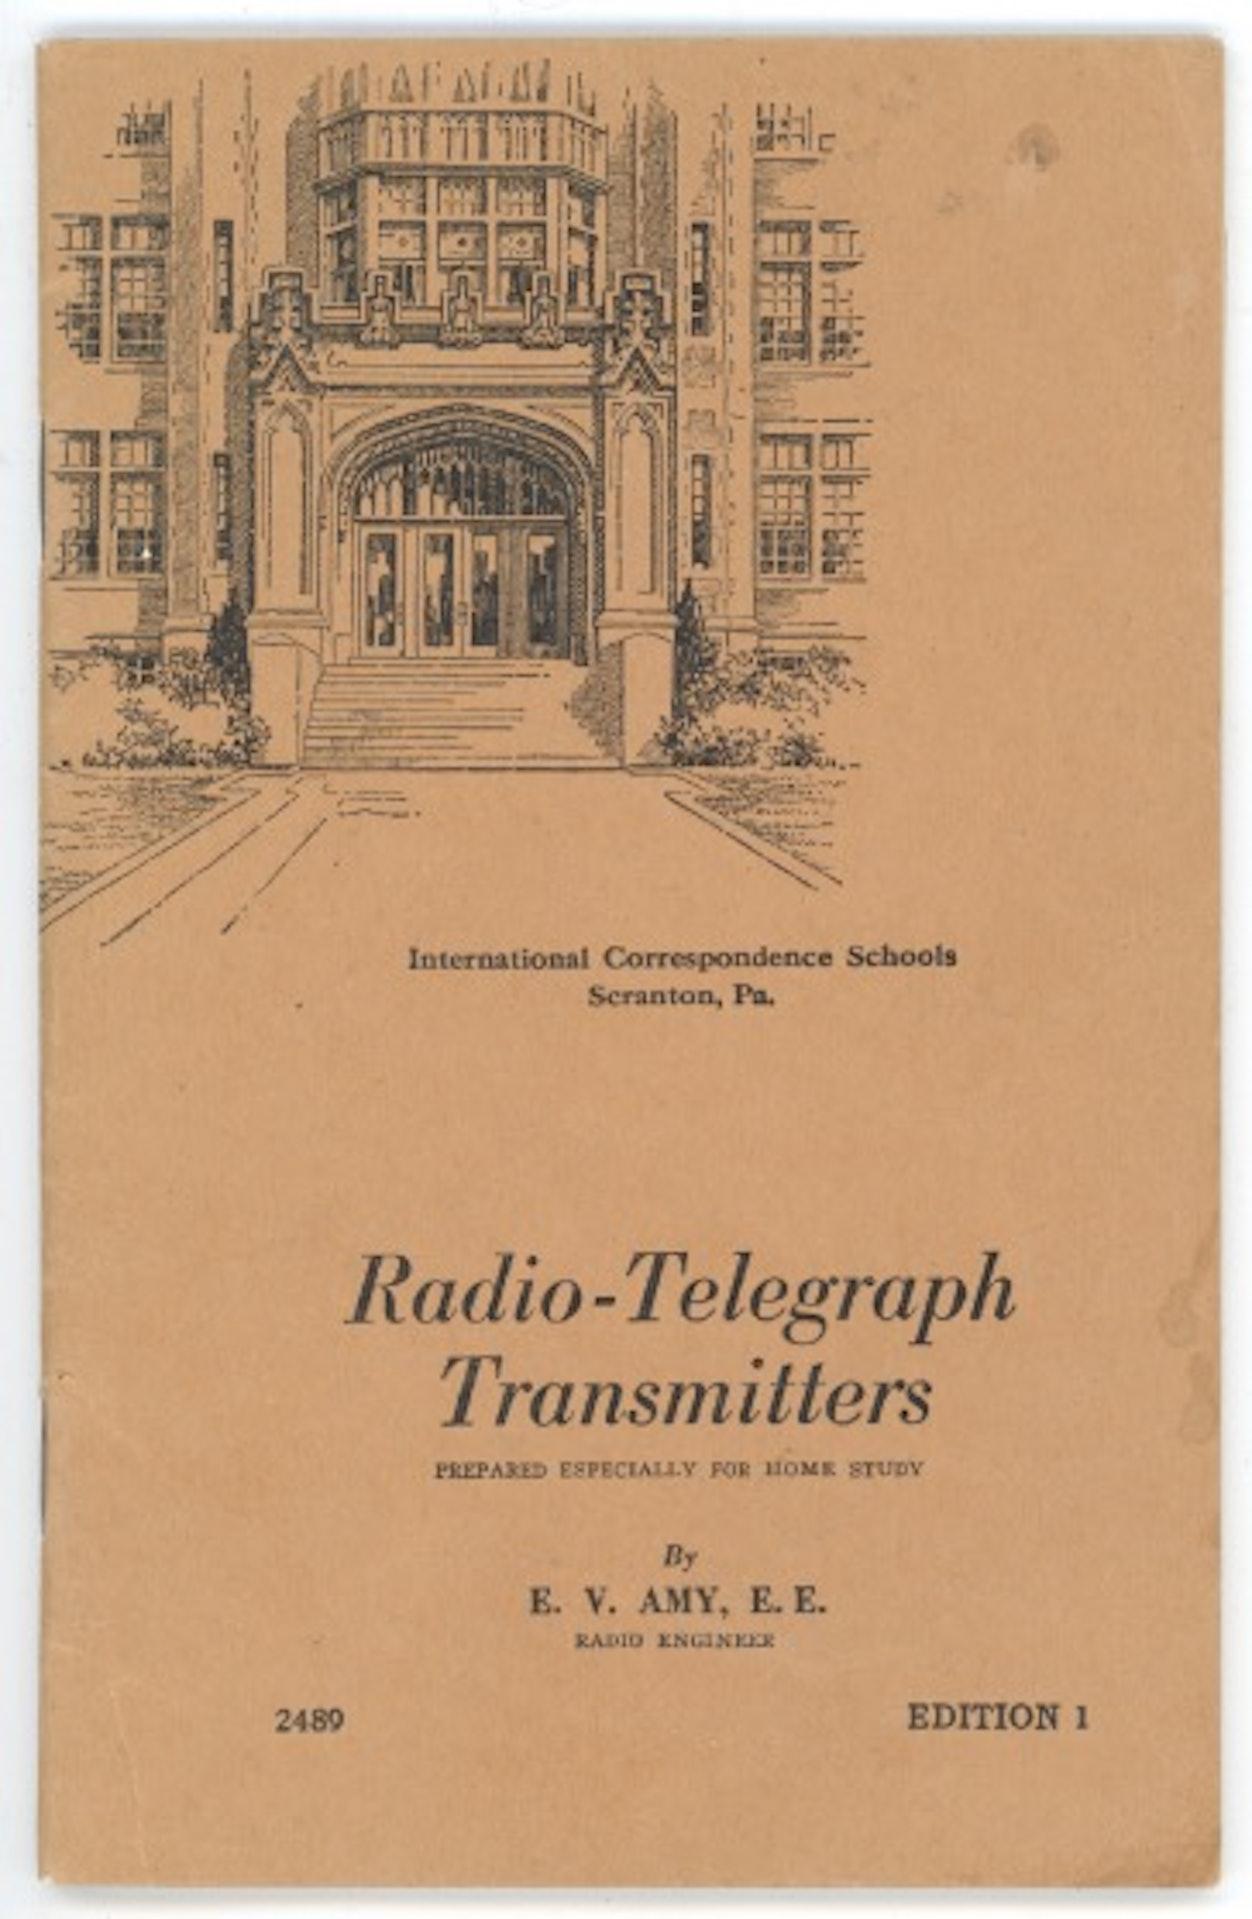 Radio-Telegraph Transmitters